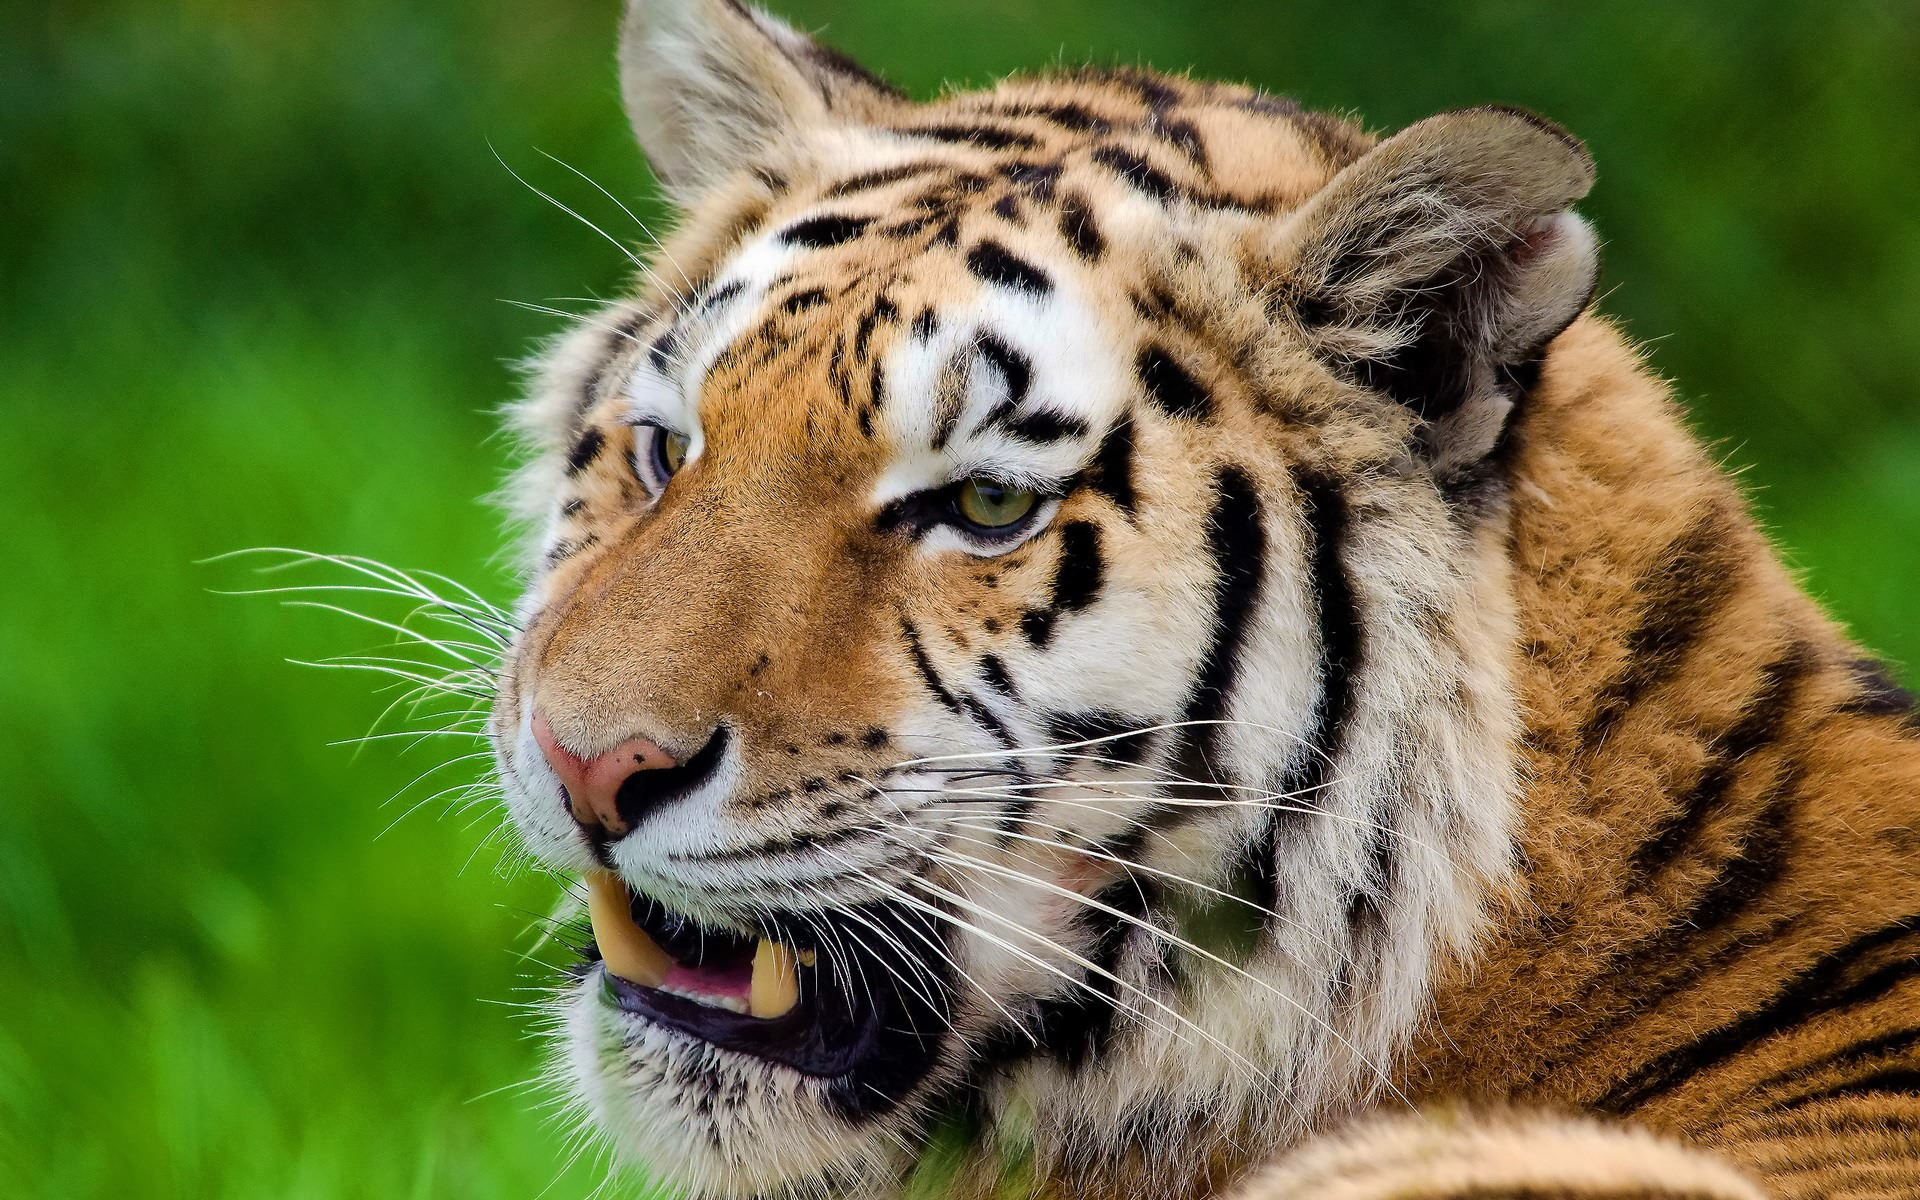 тигр оскал морда без смс